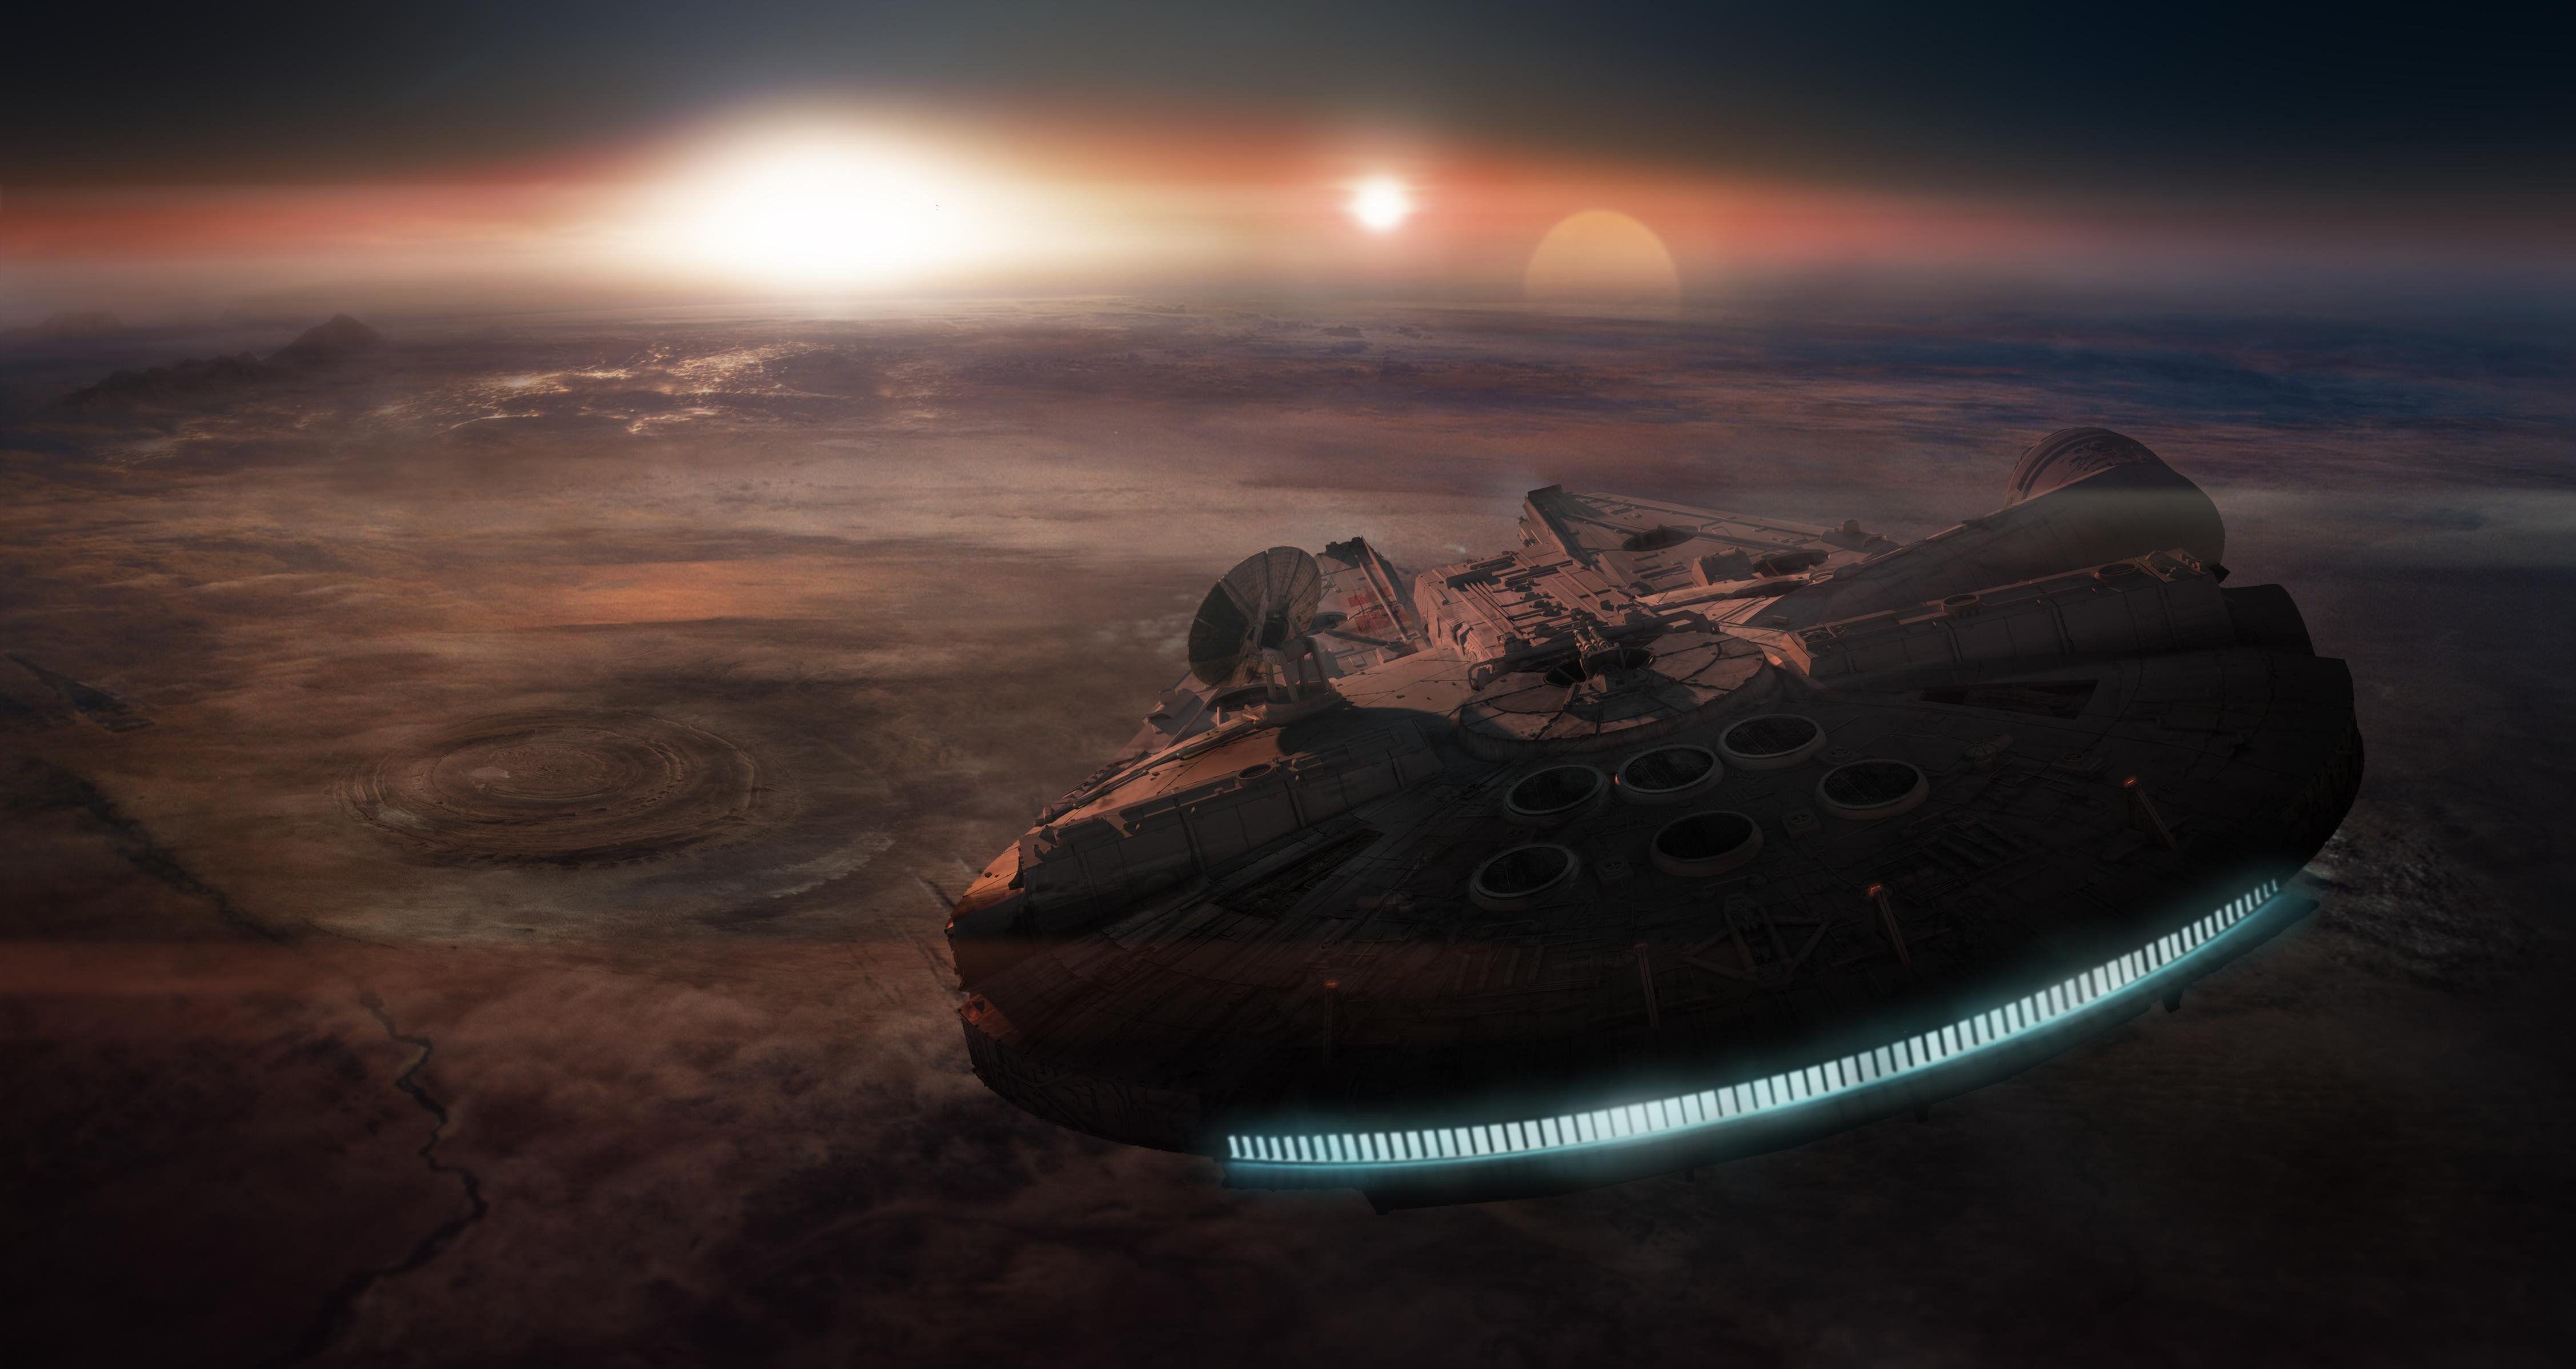 Pin By Ashley On Star Wars Star Wars Wallpaper Star Wars 7 Star Wars Episode Vii